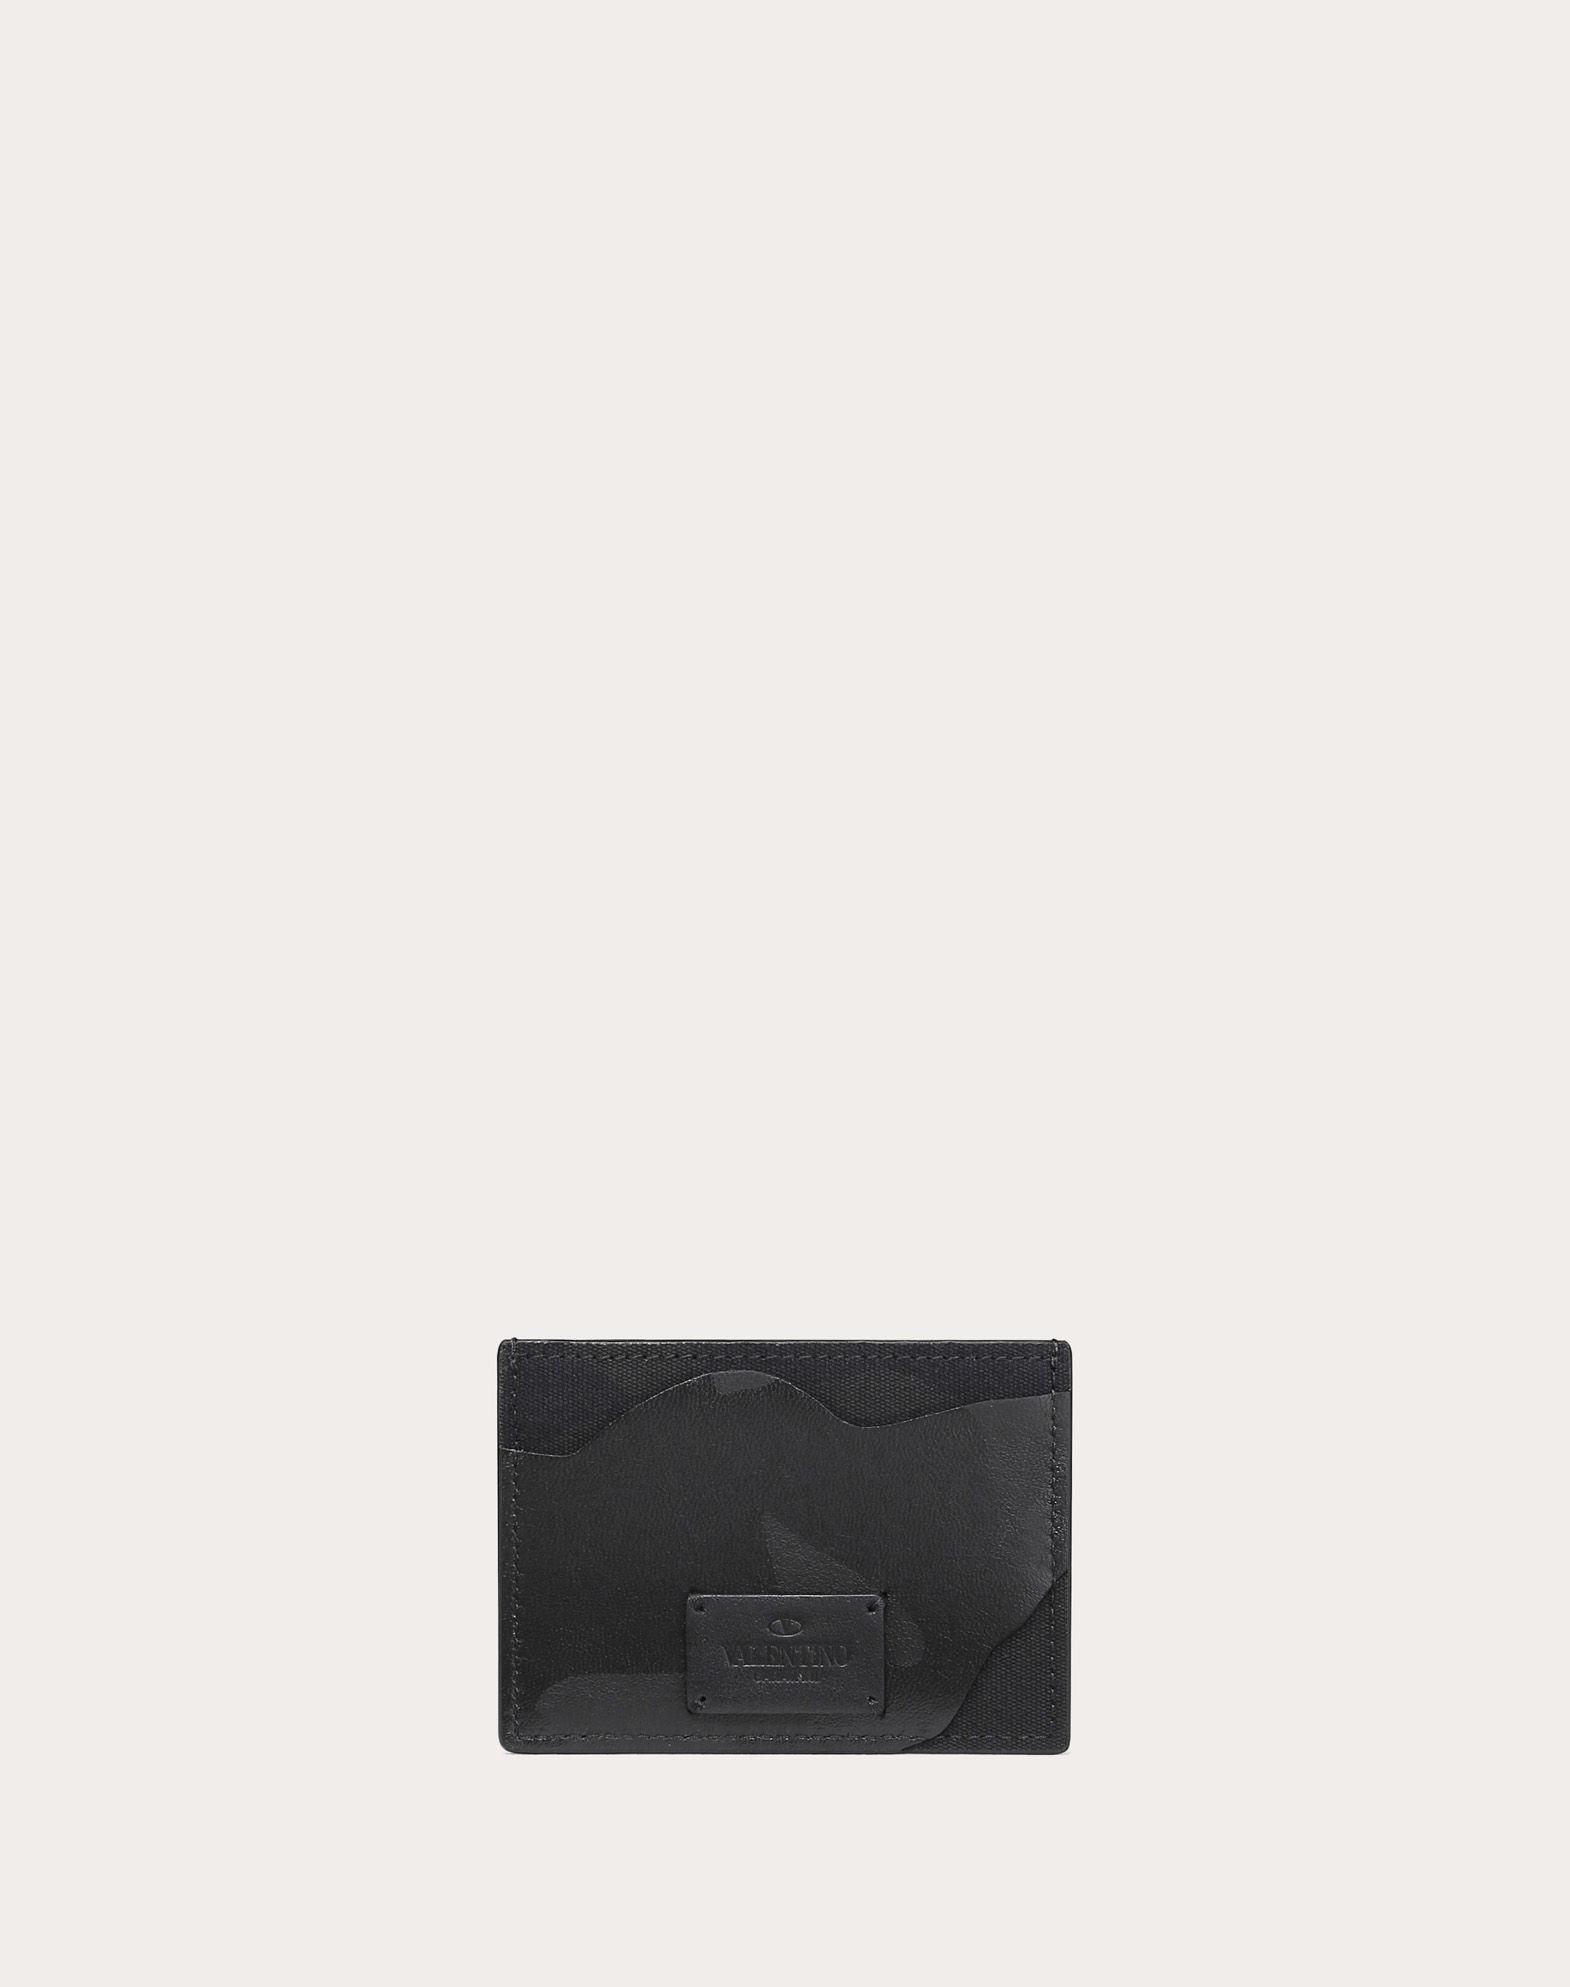 VALENTINO GARAVANI UOMO Camouflage Noir Cardholder COIN PURSES & CARD CASES U d